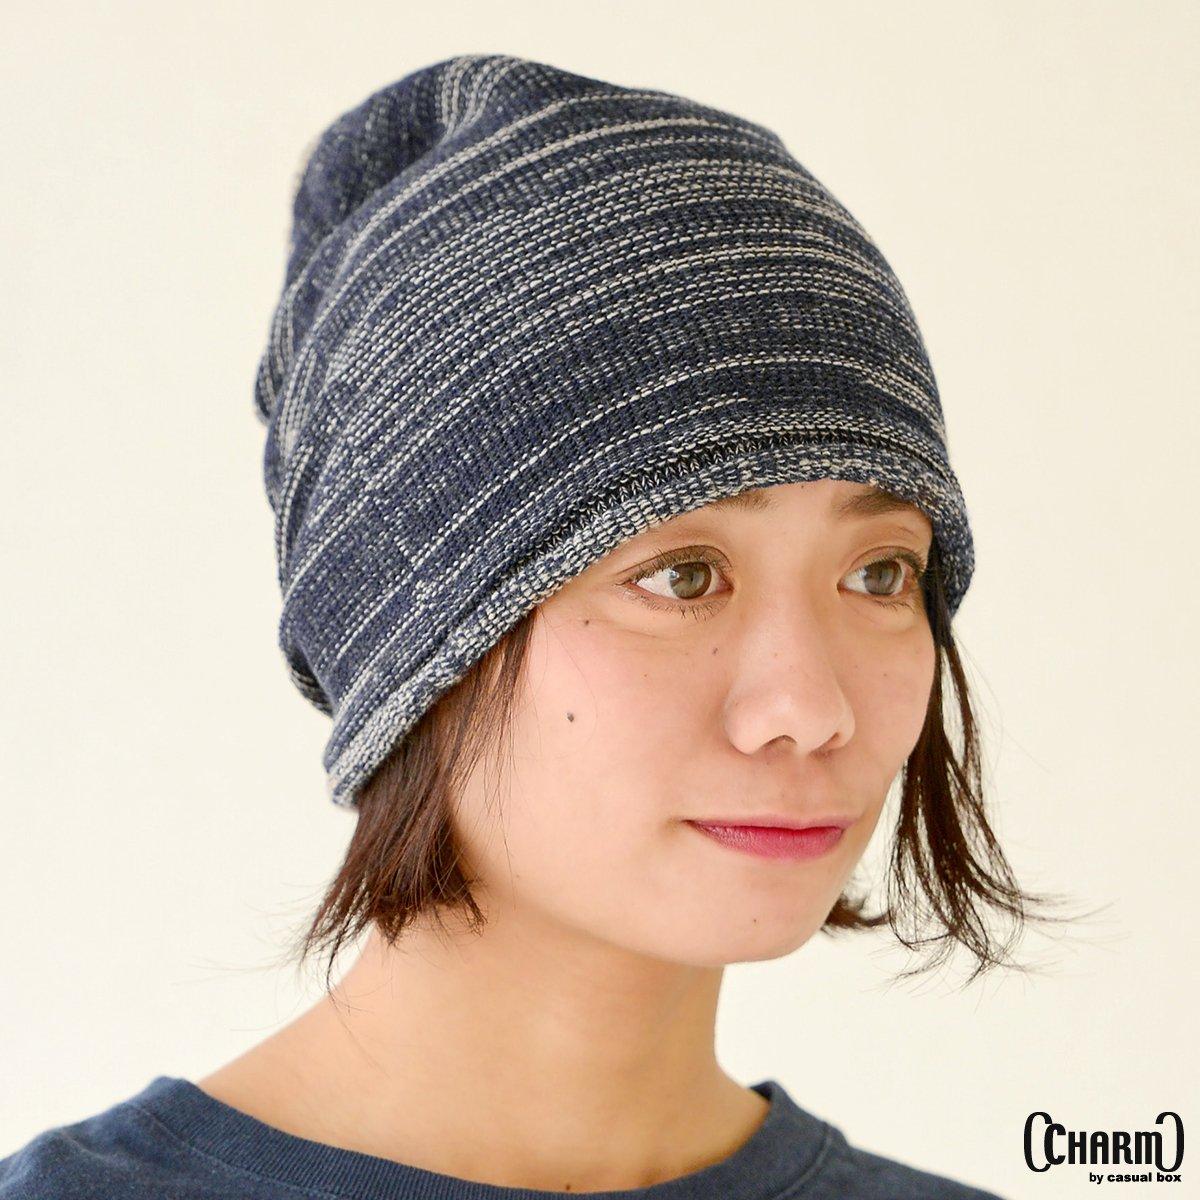 Amazon.com  CHARM Mens Slouchy Beanie Winter - Womens Wool Knit Hat Warm  Baggy Japanese Cap Black  Clothing a733b2ab9519